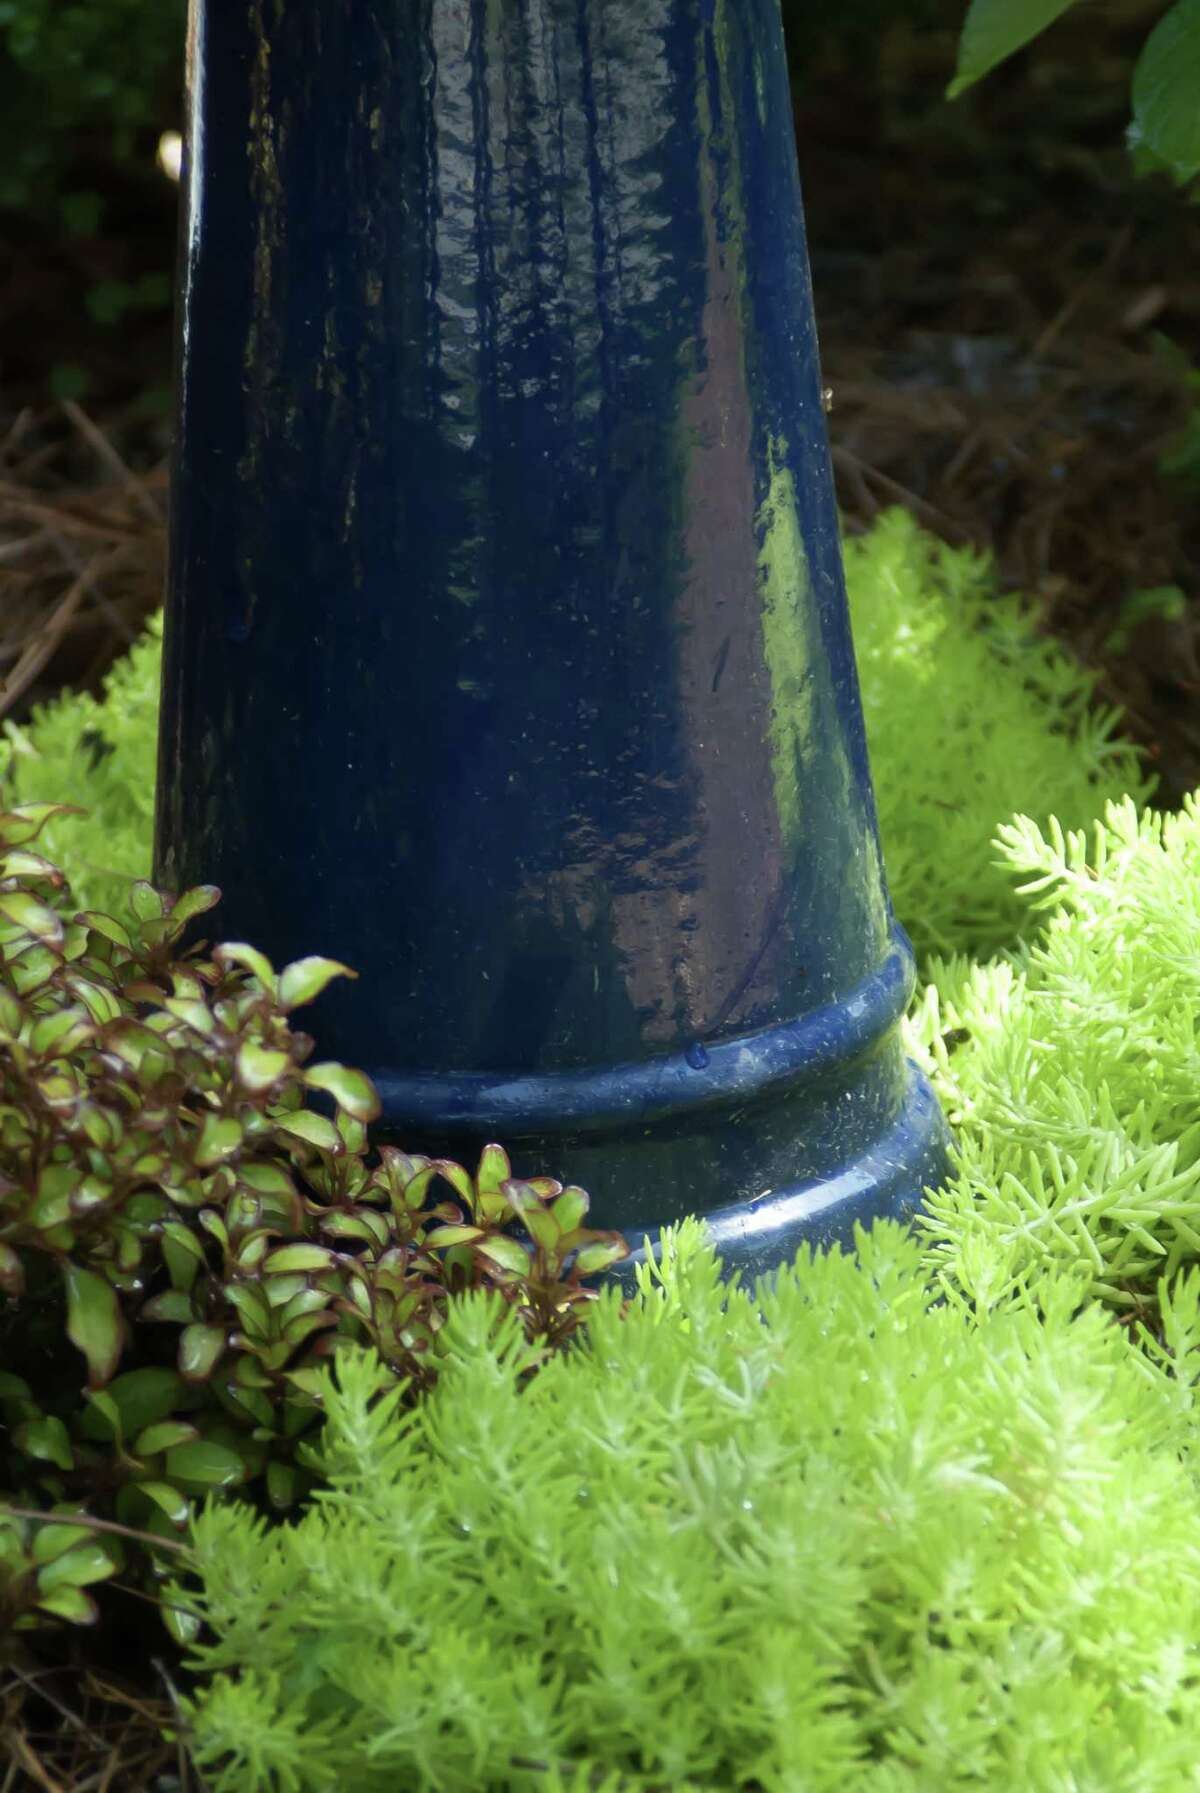 Lemon Coral sedum and Waxwing Orange mirror bush dazzle in partnership with blue glazed bird bath. (Norman Winter/TNS)